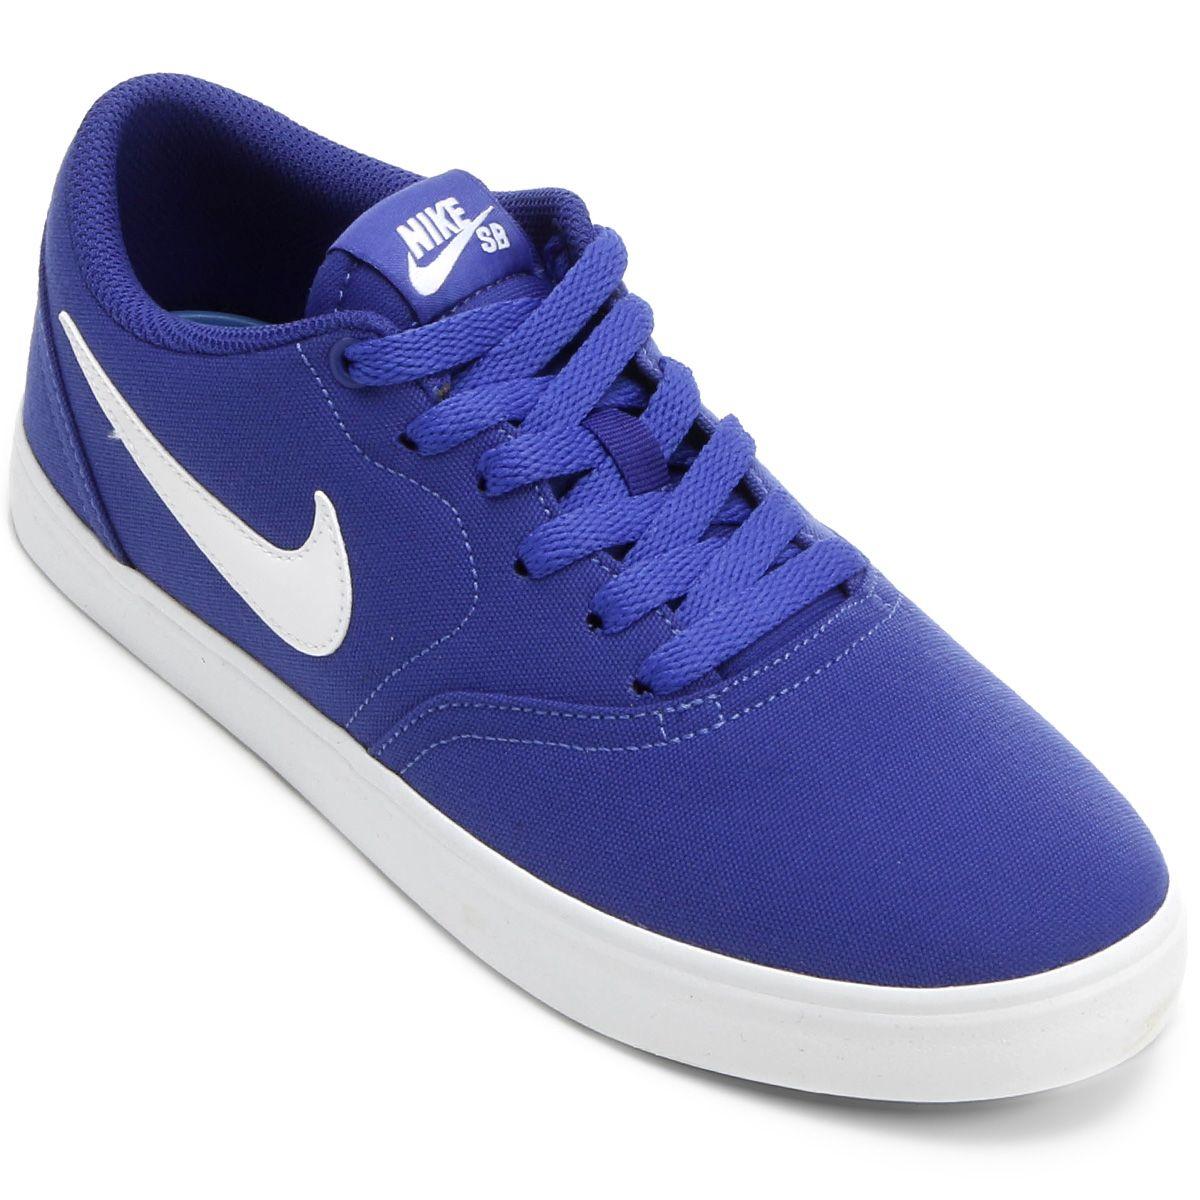 Tenis Nike Sb Check Solar Cnvs Masculino Preto E Azul Tenis Nike Sb Check Nike Sb Tenis Nike Sb